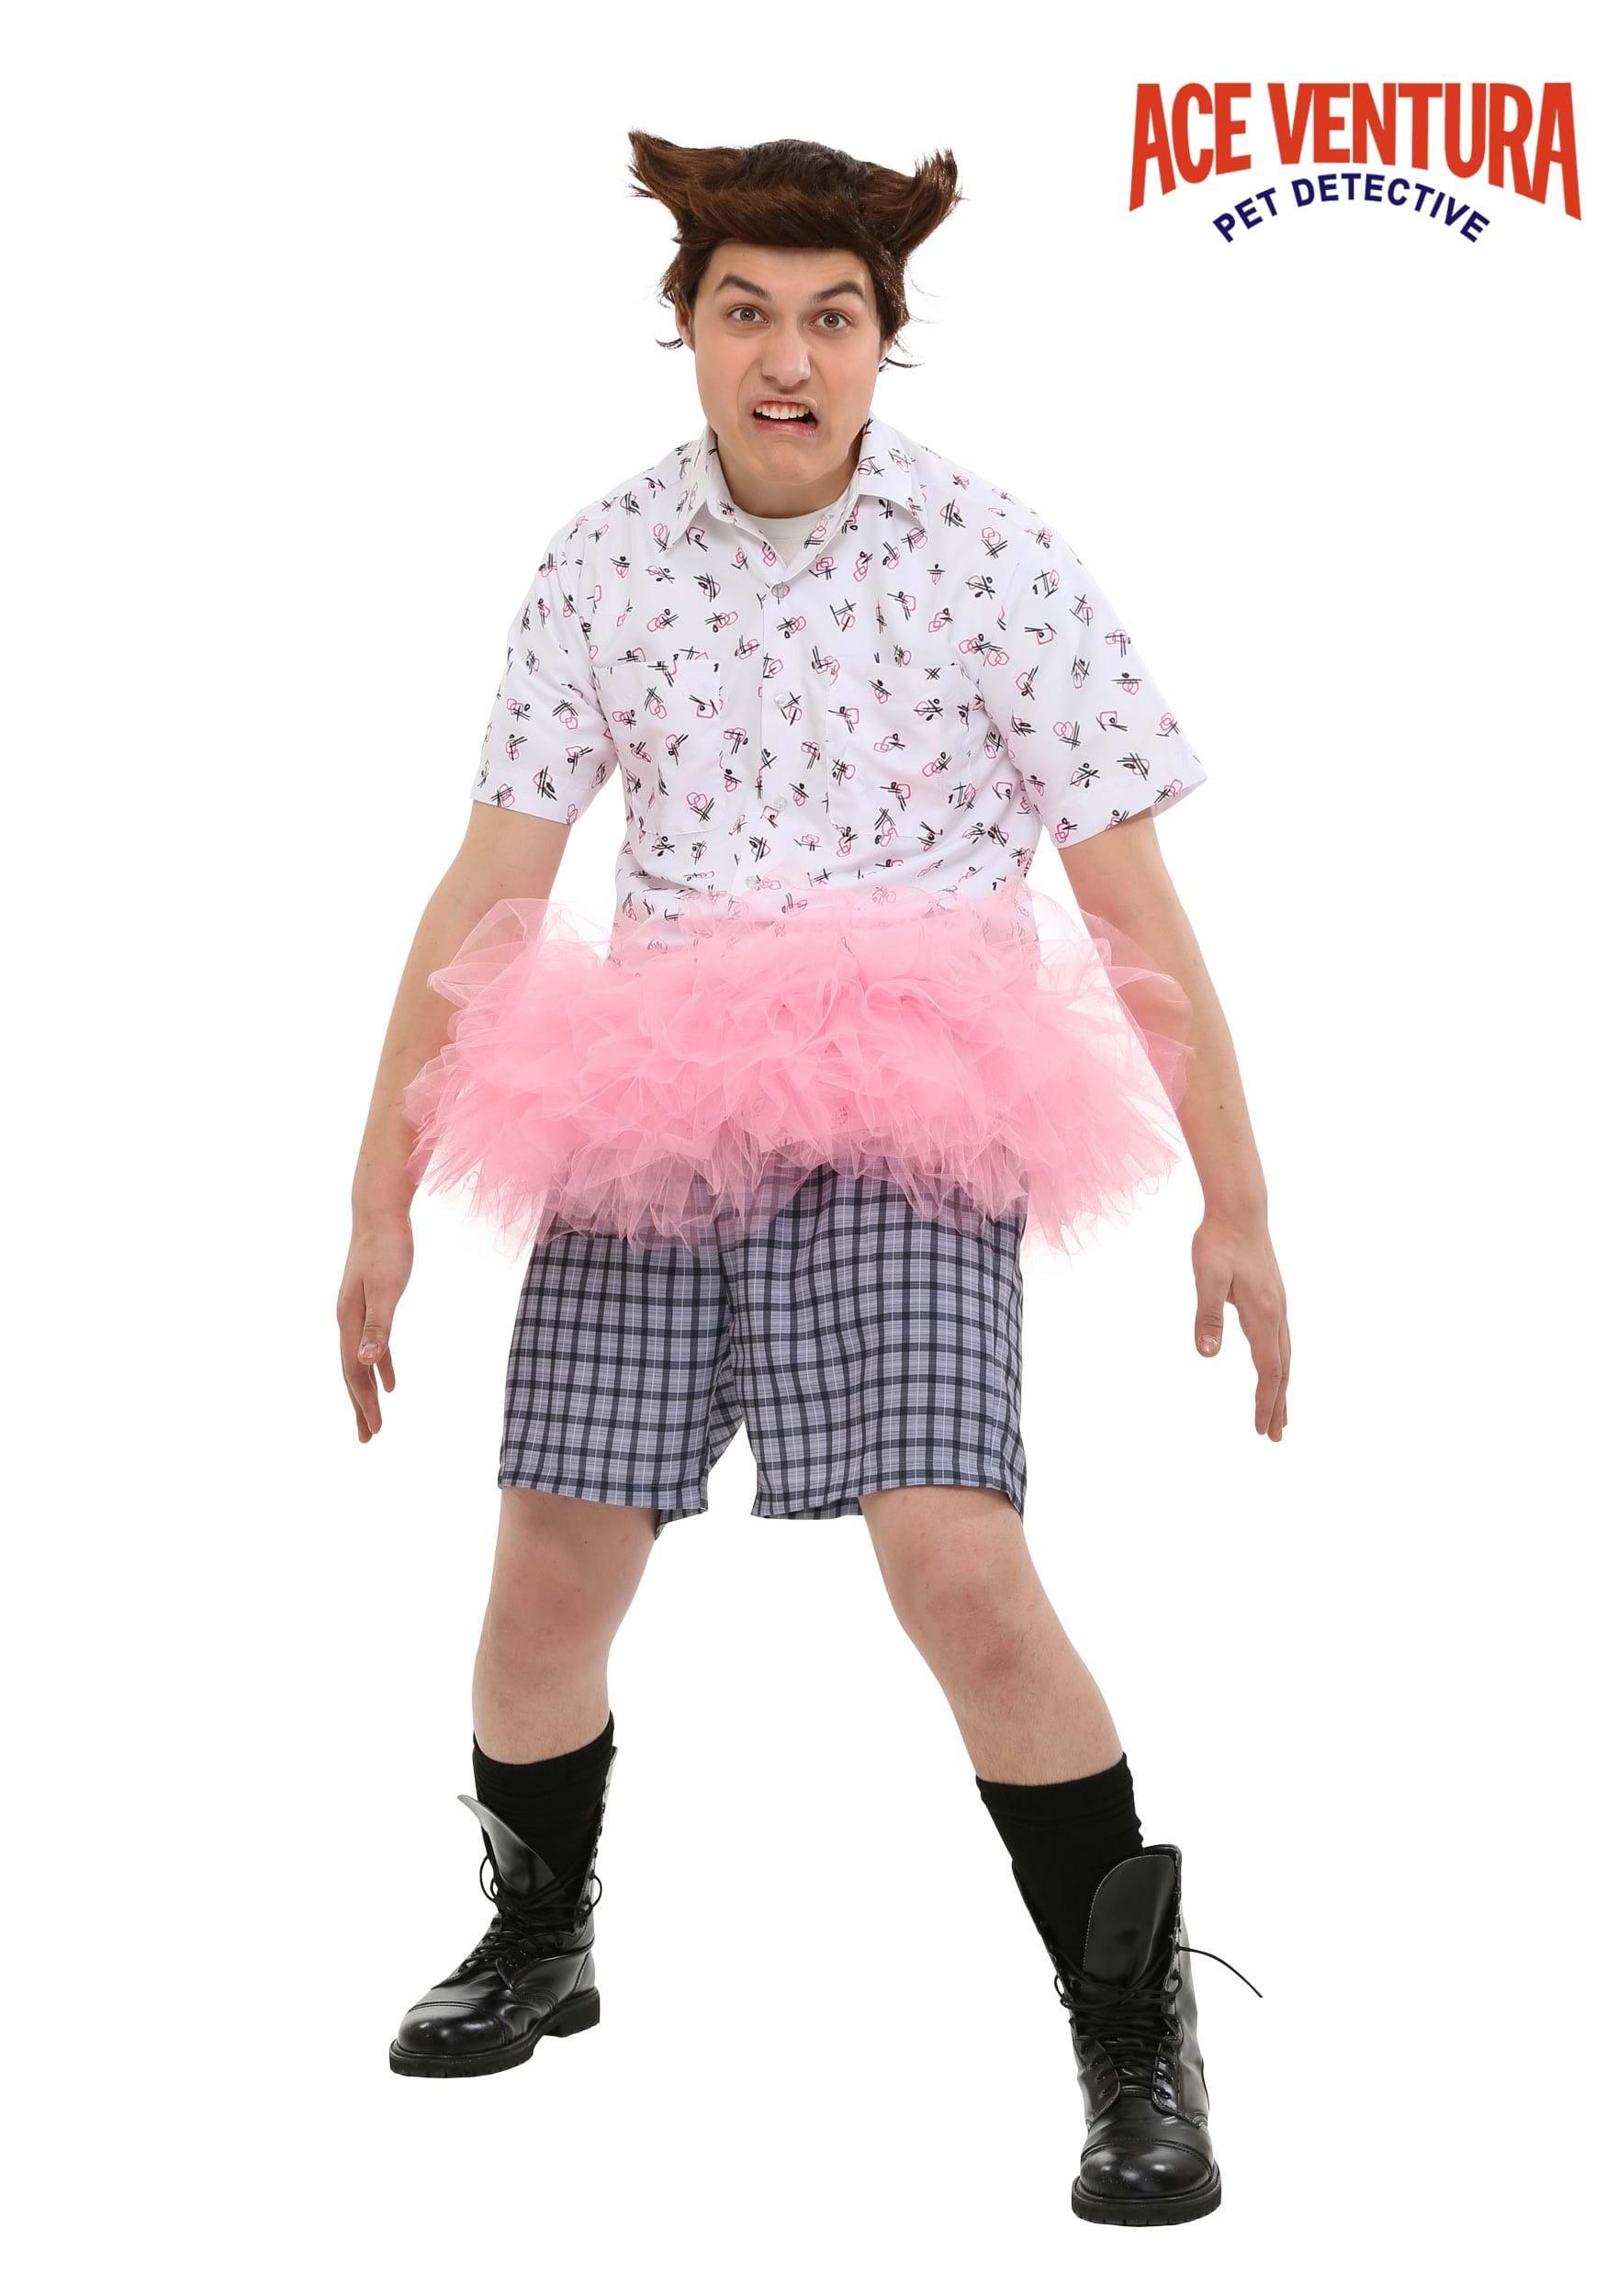 Ace Ventura Tutu Costume - 352.1KB